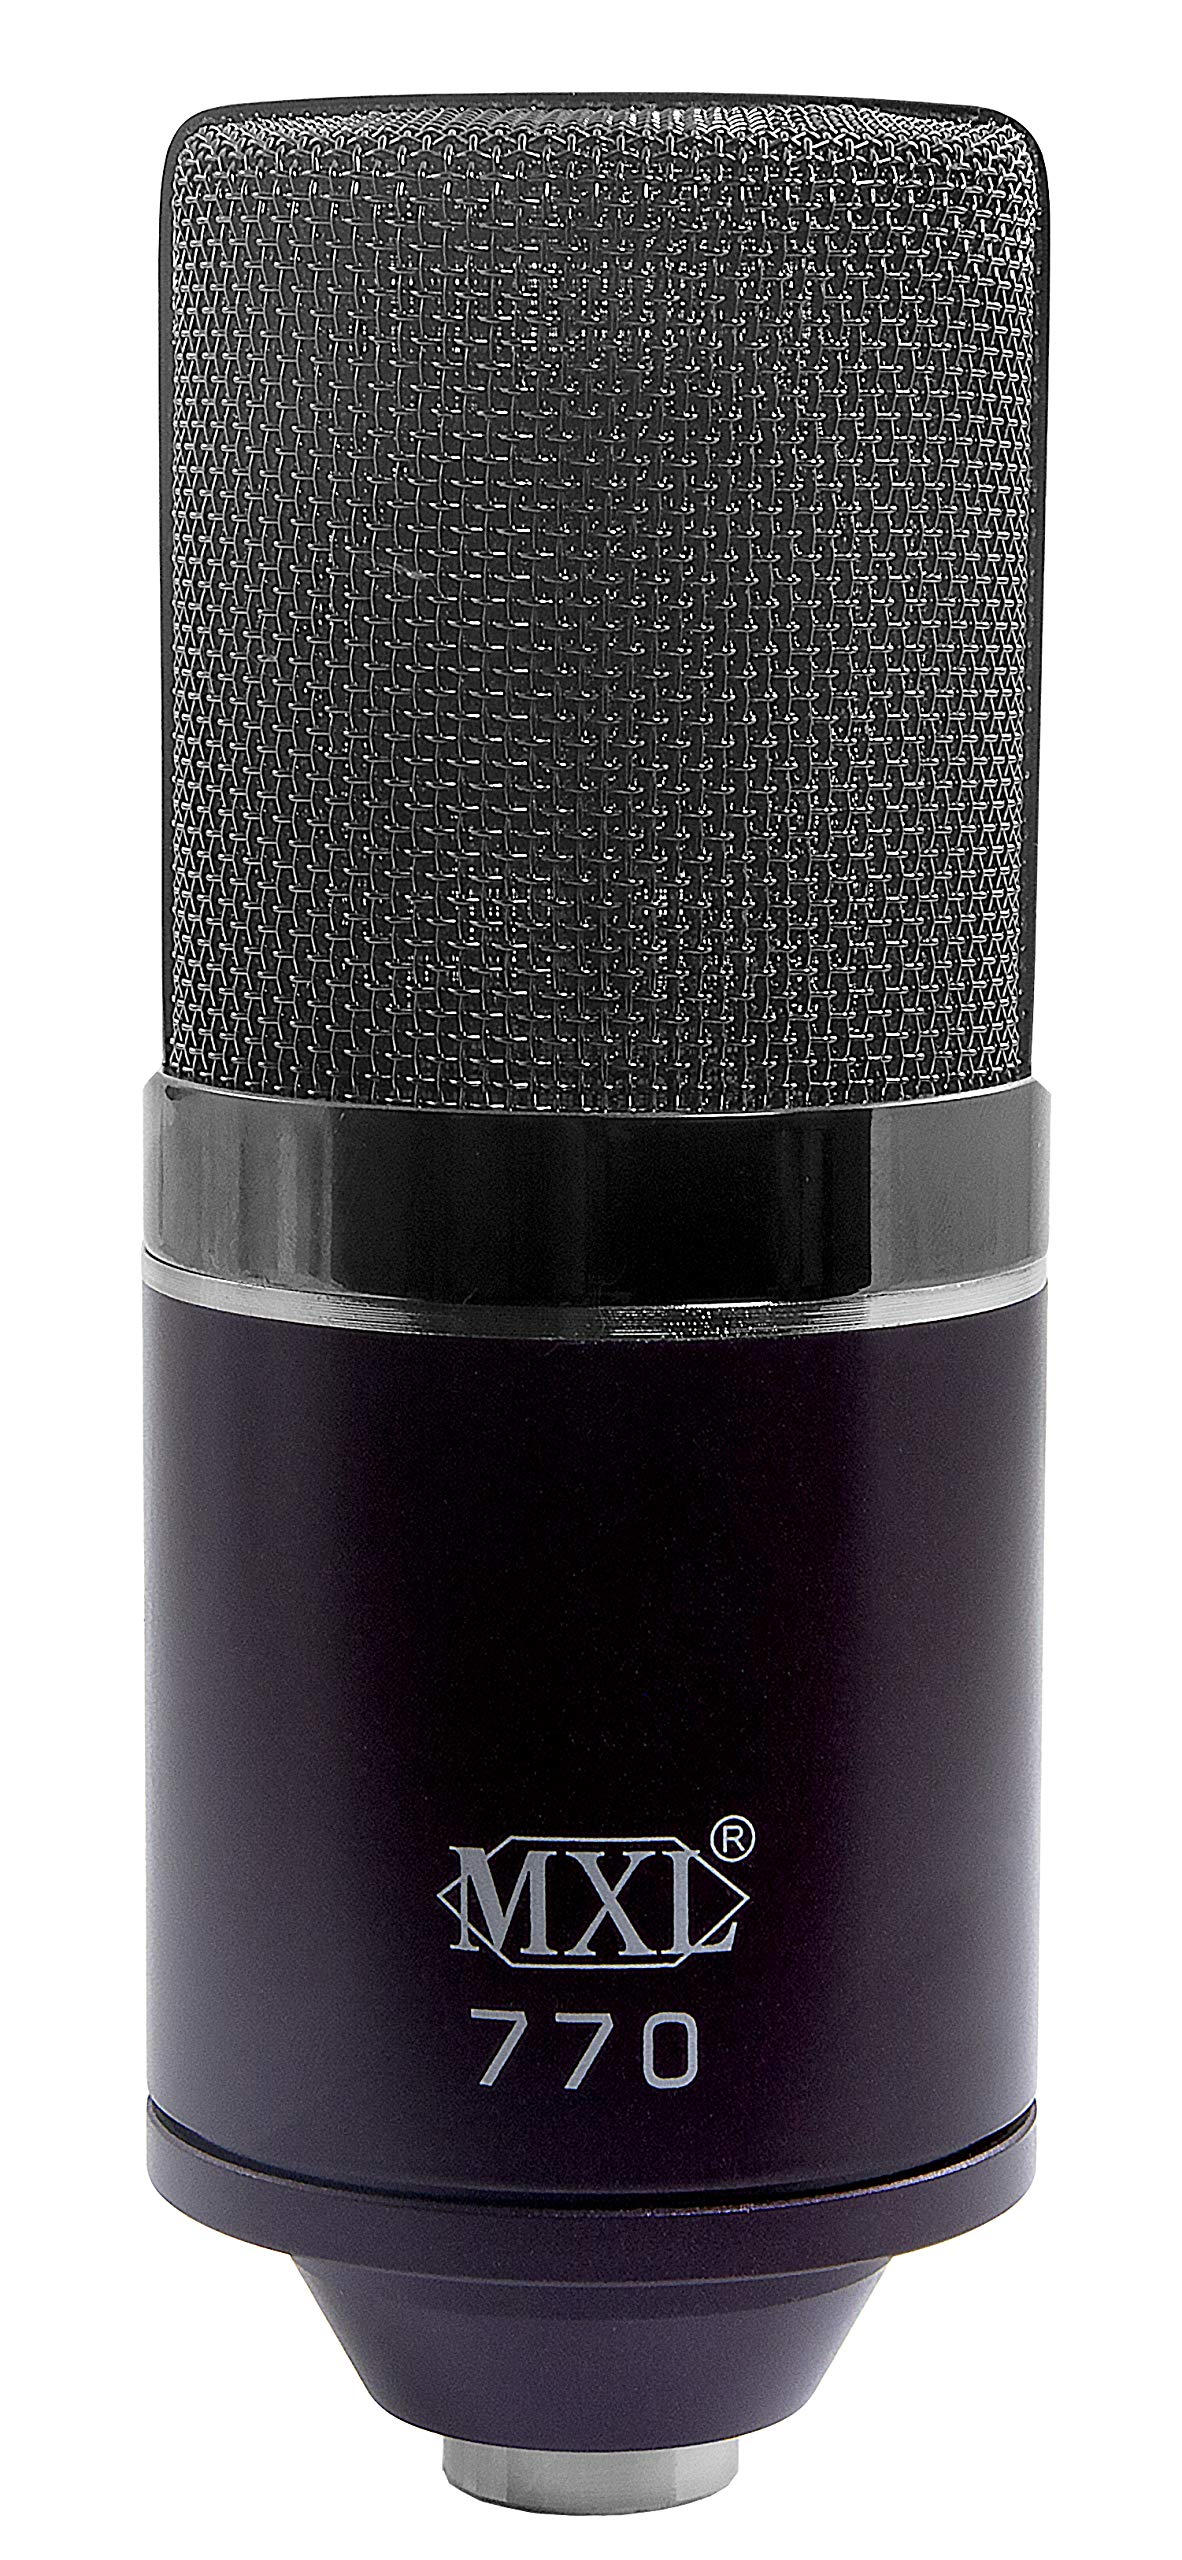 MXL Mics Condenser Microphone, 770 MIDNIGHT (MXL770MIDNIGHT)